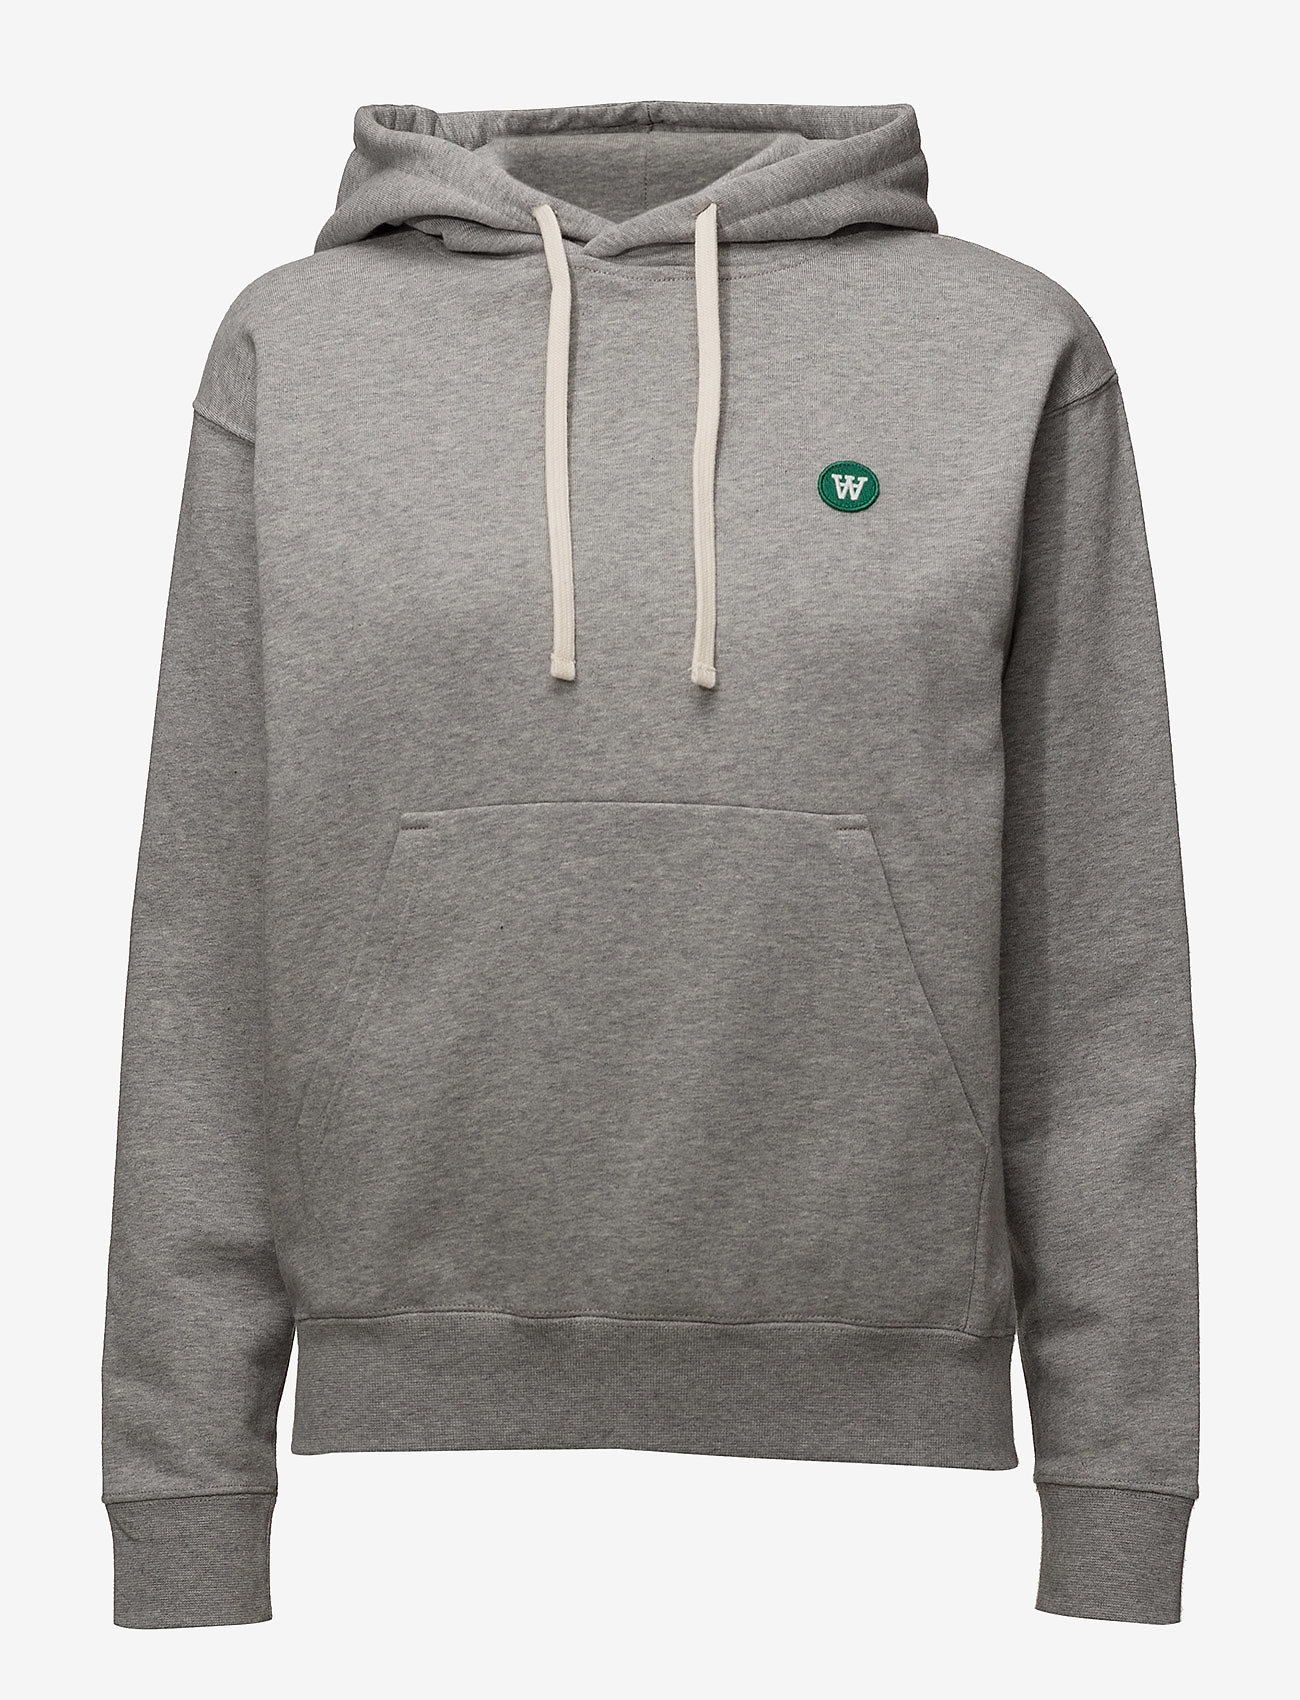 Wood Wood - Jenn hoodie - hettegensere - grey melange - 0